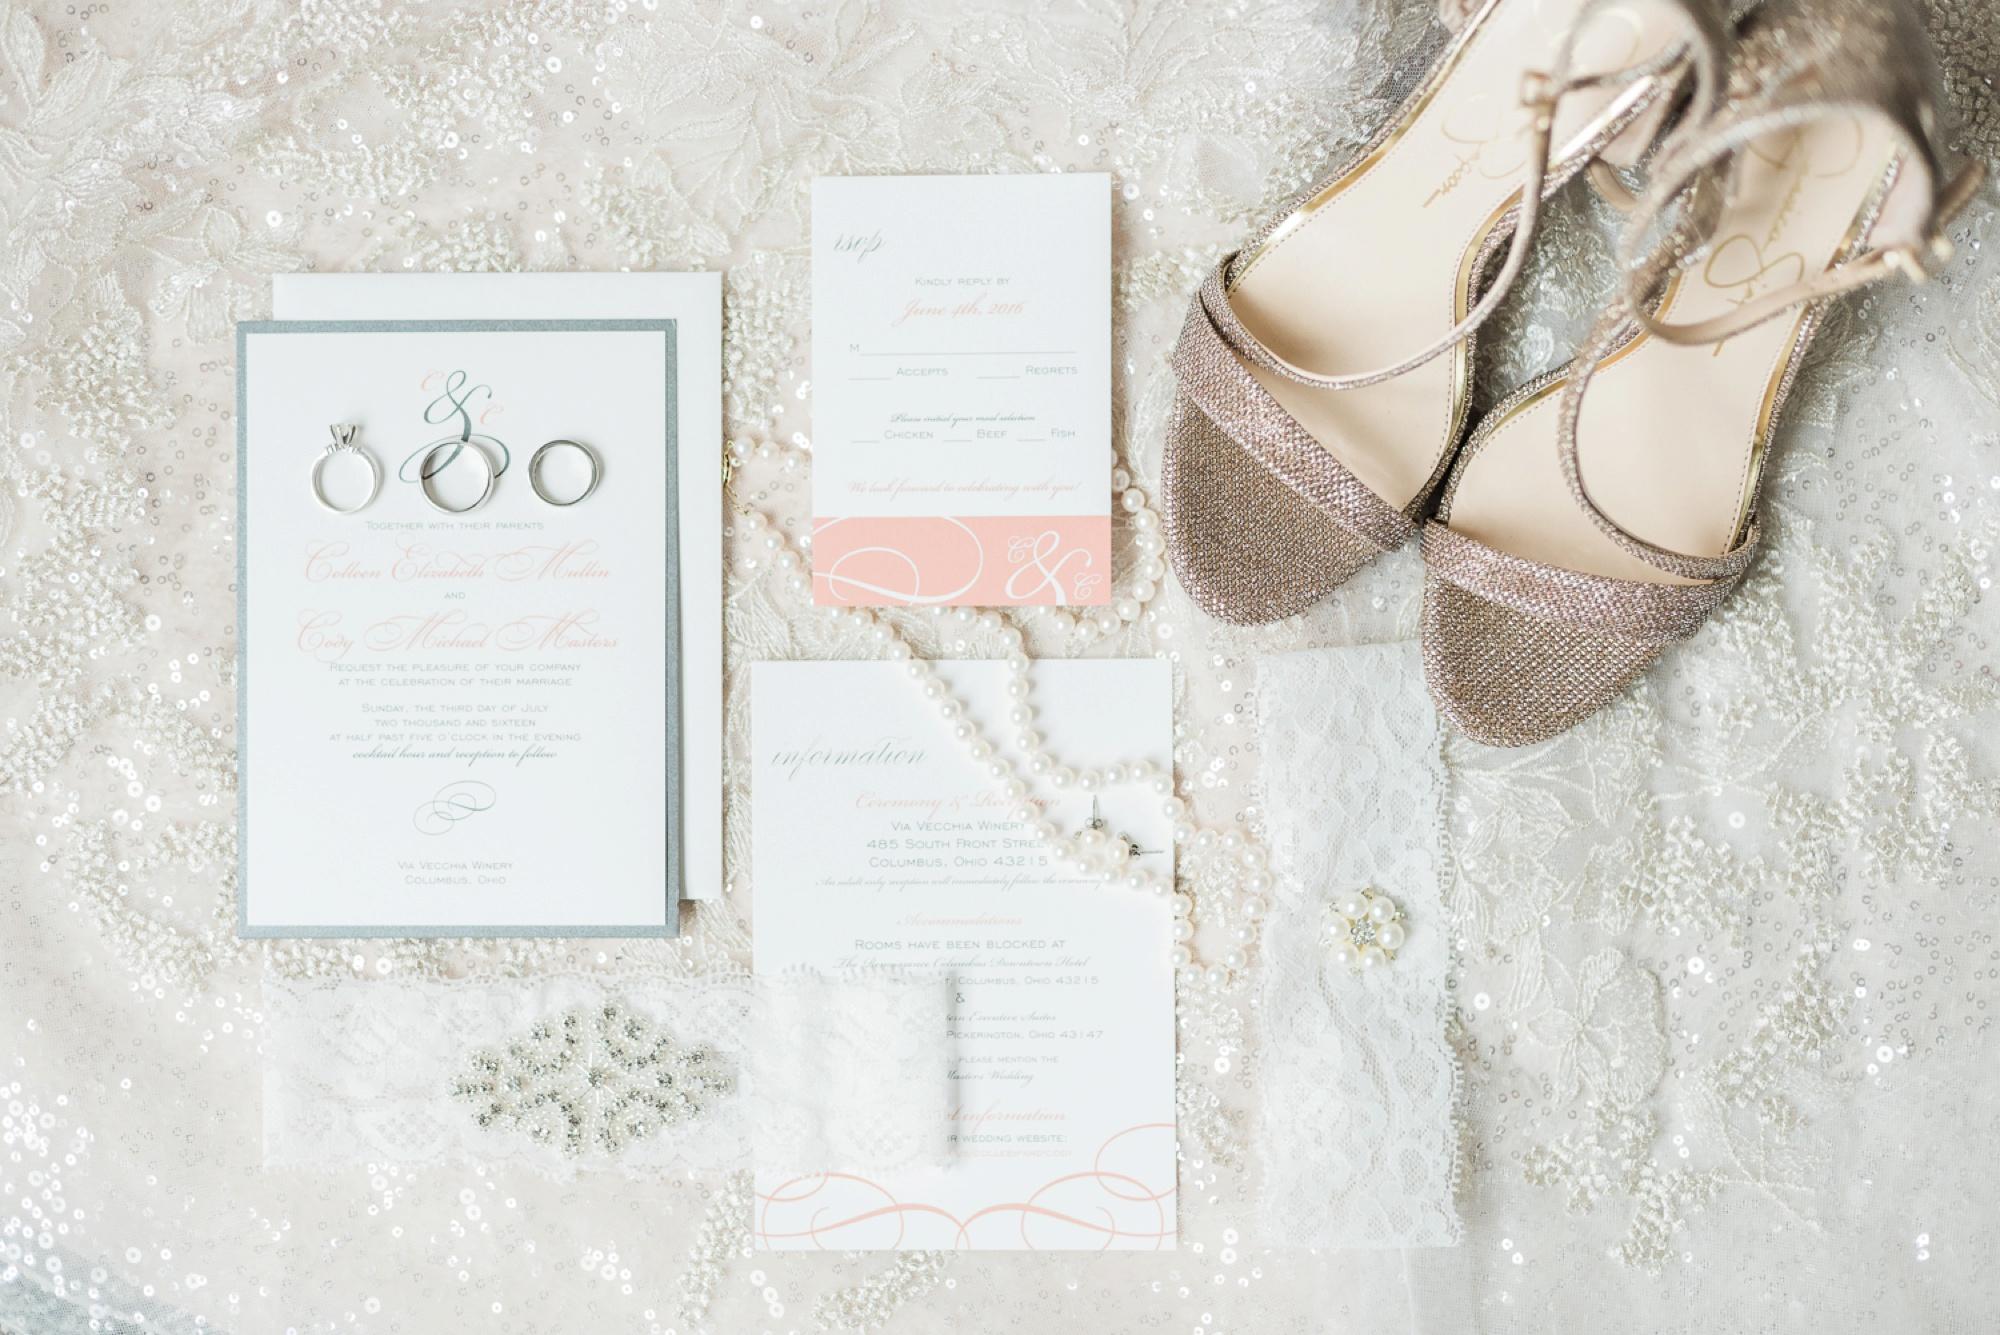 via-vecchia-winery-wedding-columbus-ohio-1.jpg